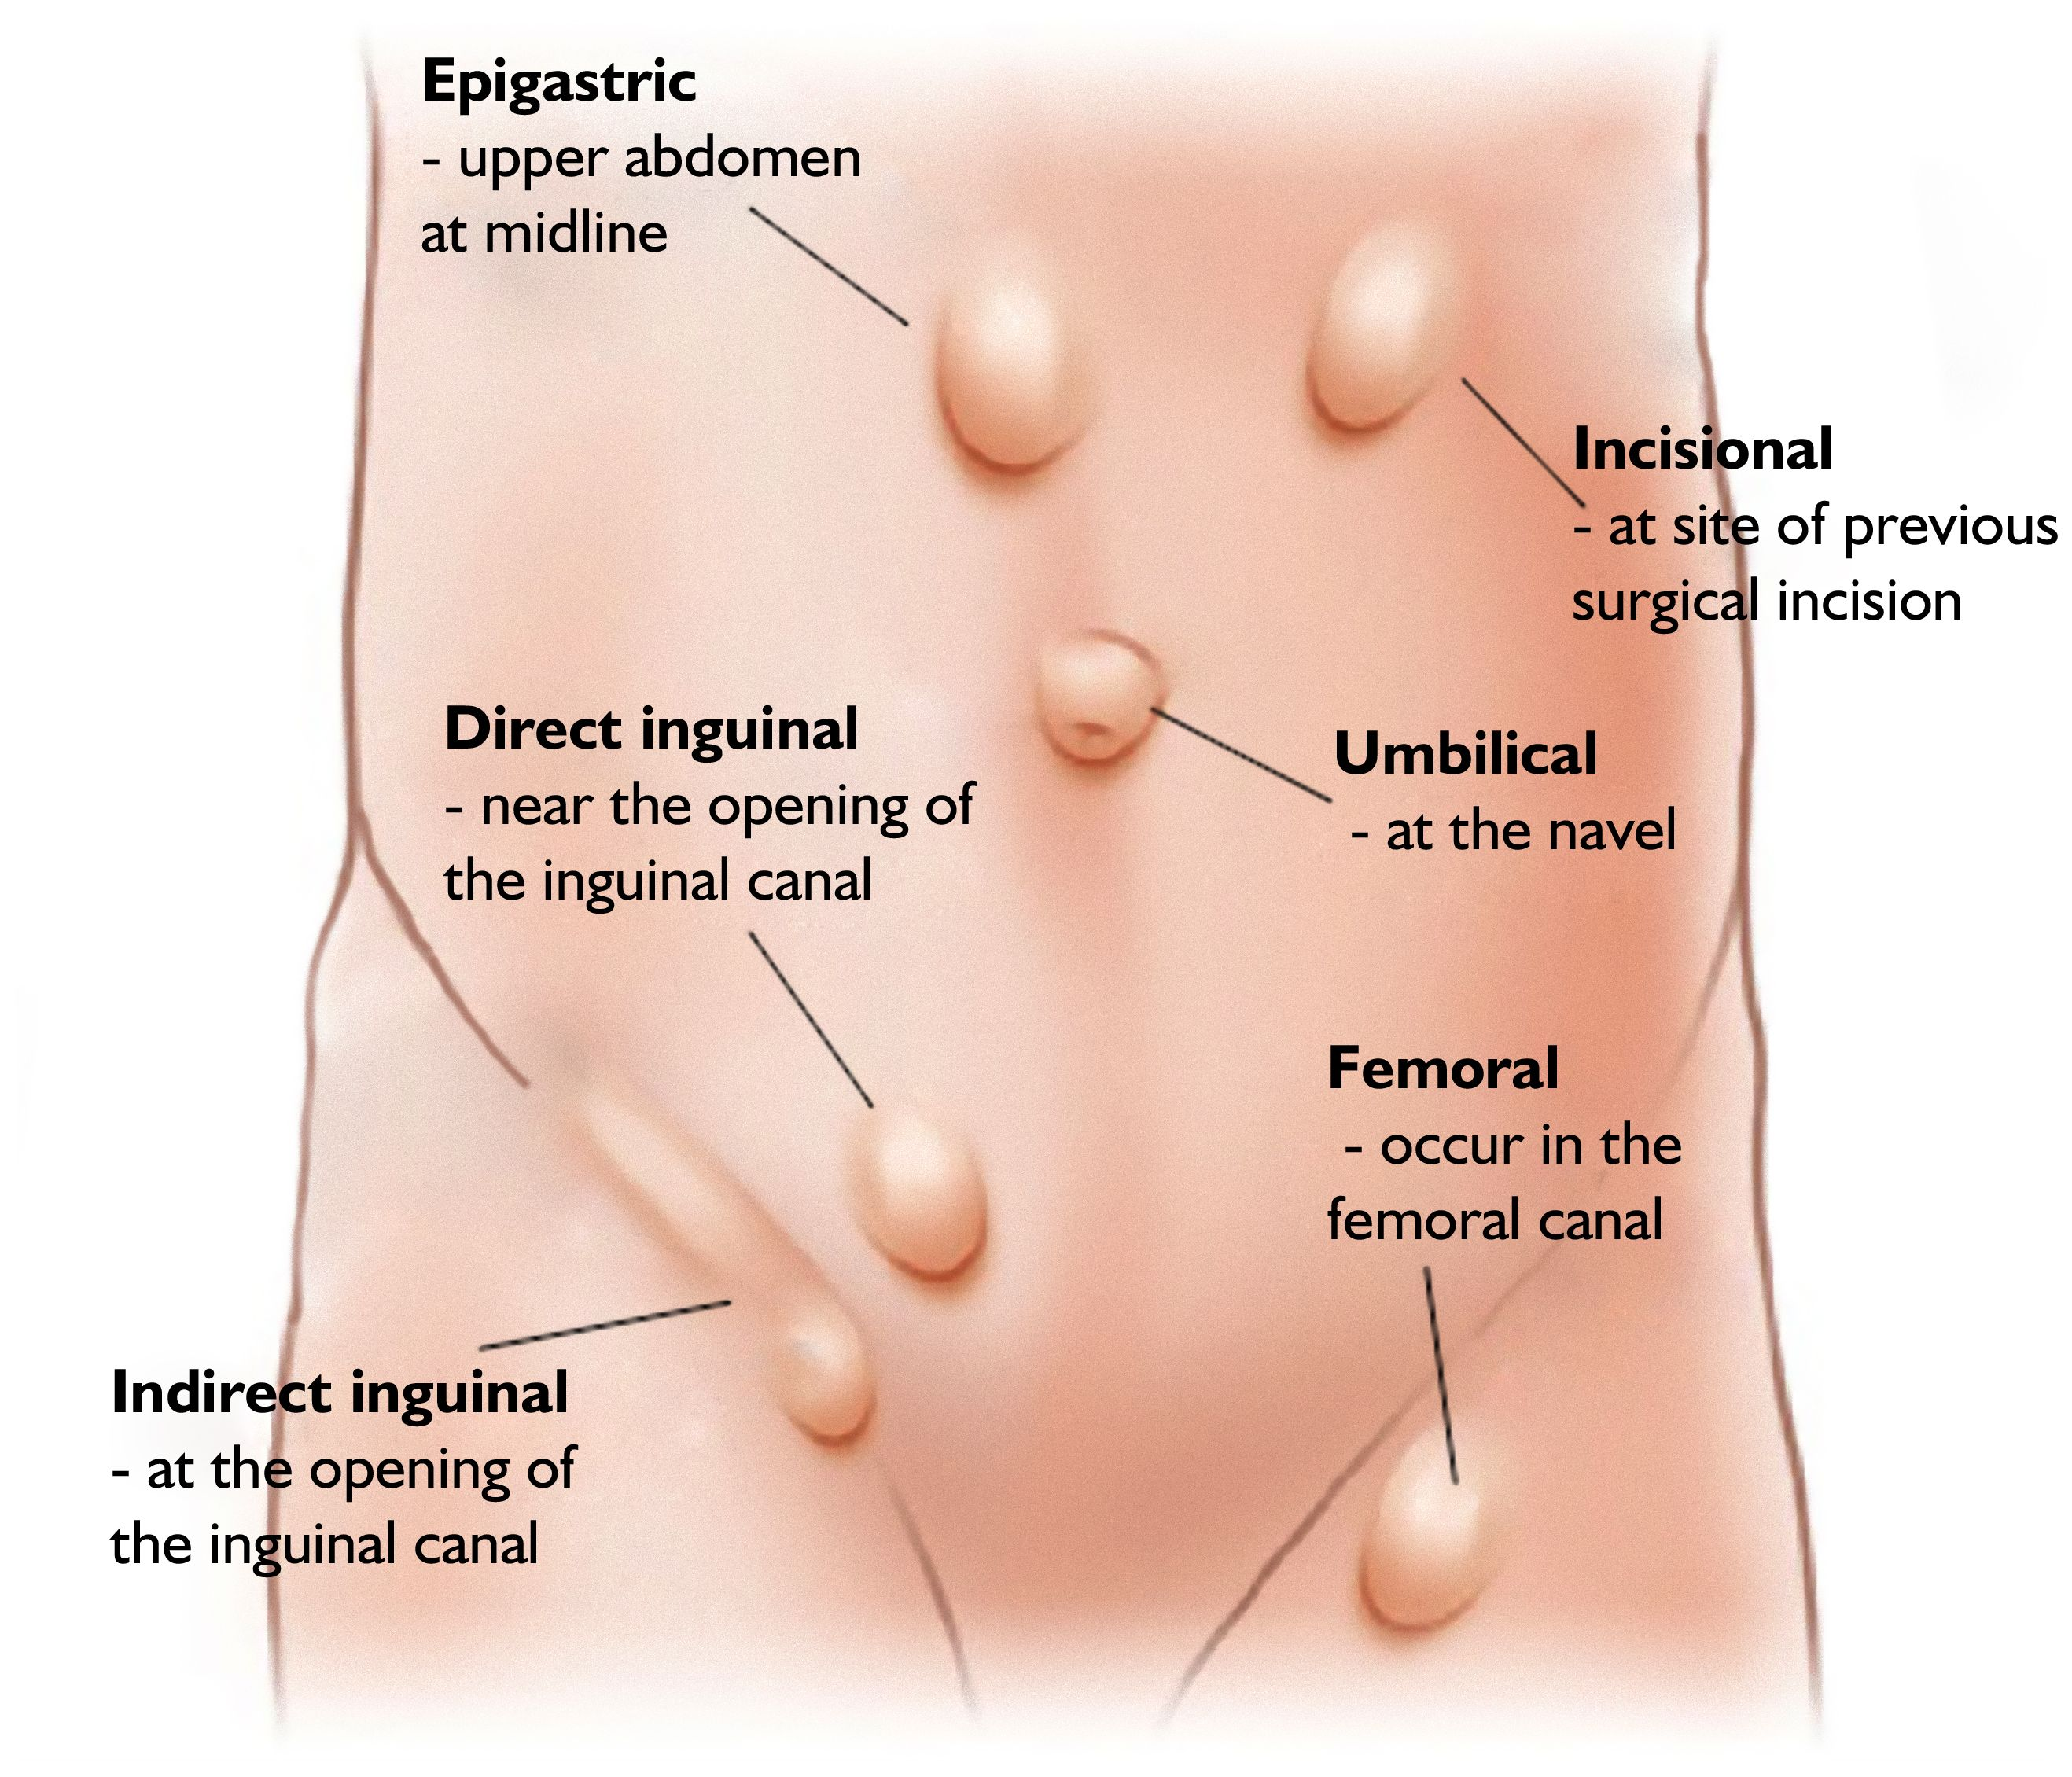 inguinal hernia anatomy in female hernia repair teeth to toe [ 2635 x 2260 Pixel ]